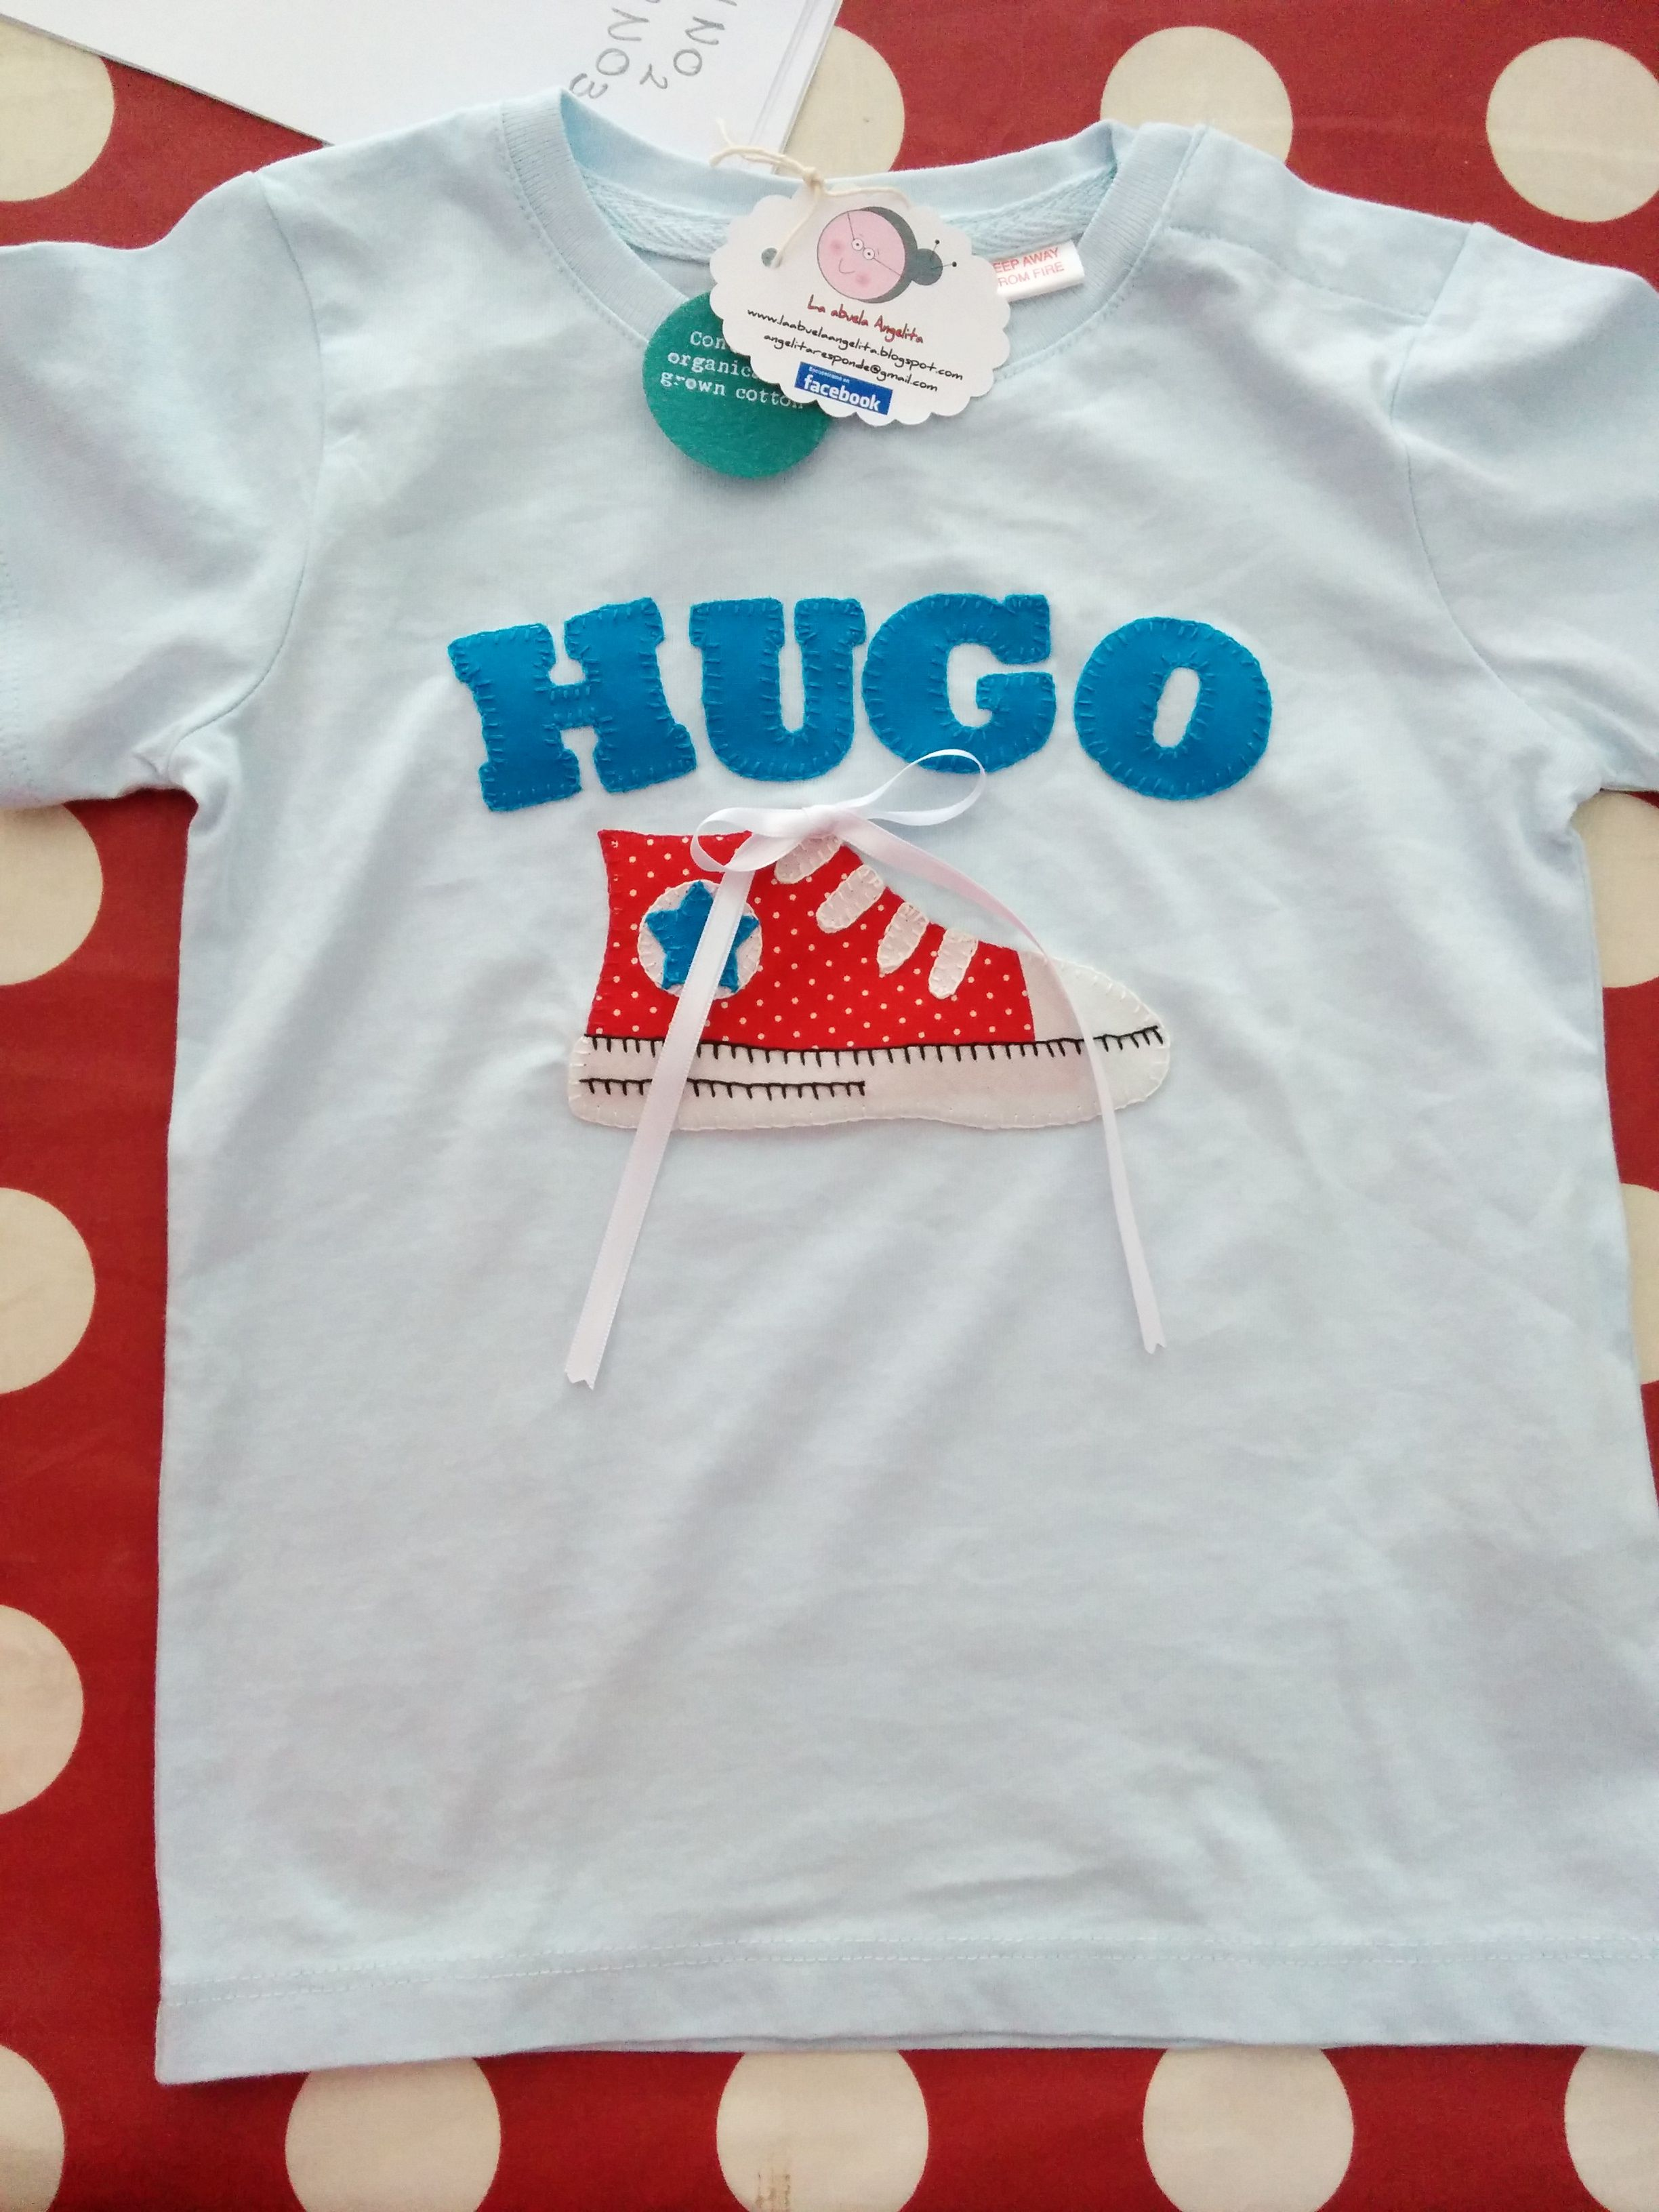 Camiseta personalizada niño zapatilla bota patchwork converse